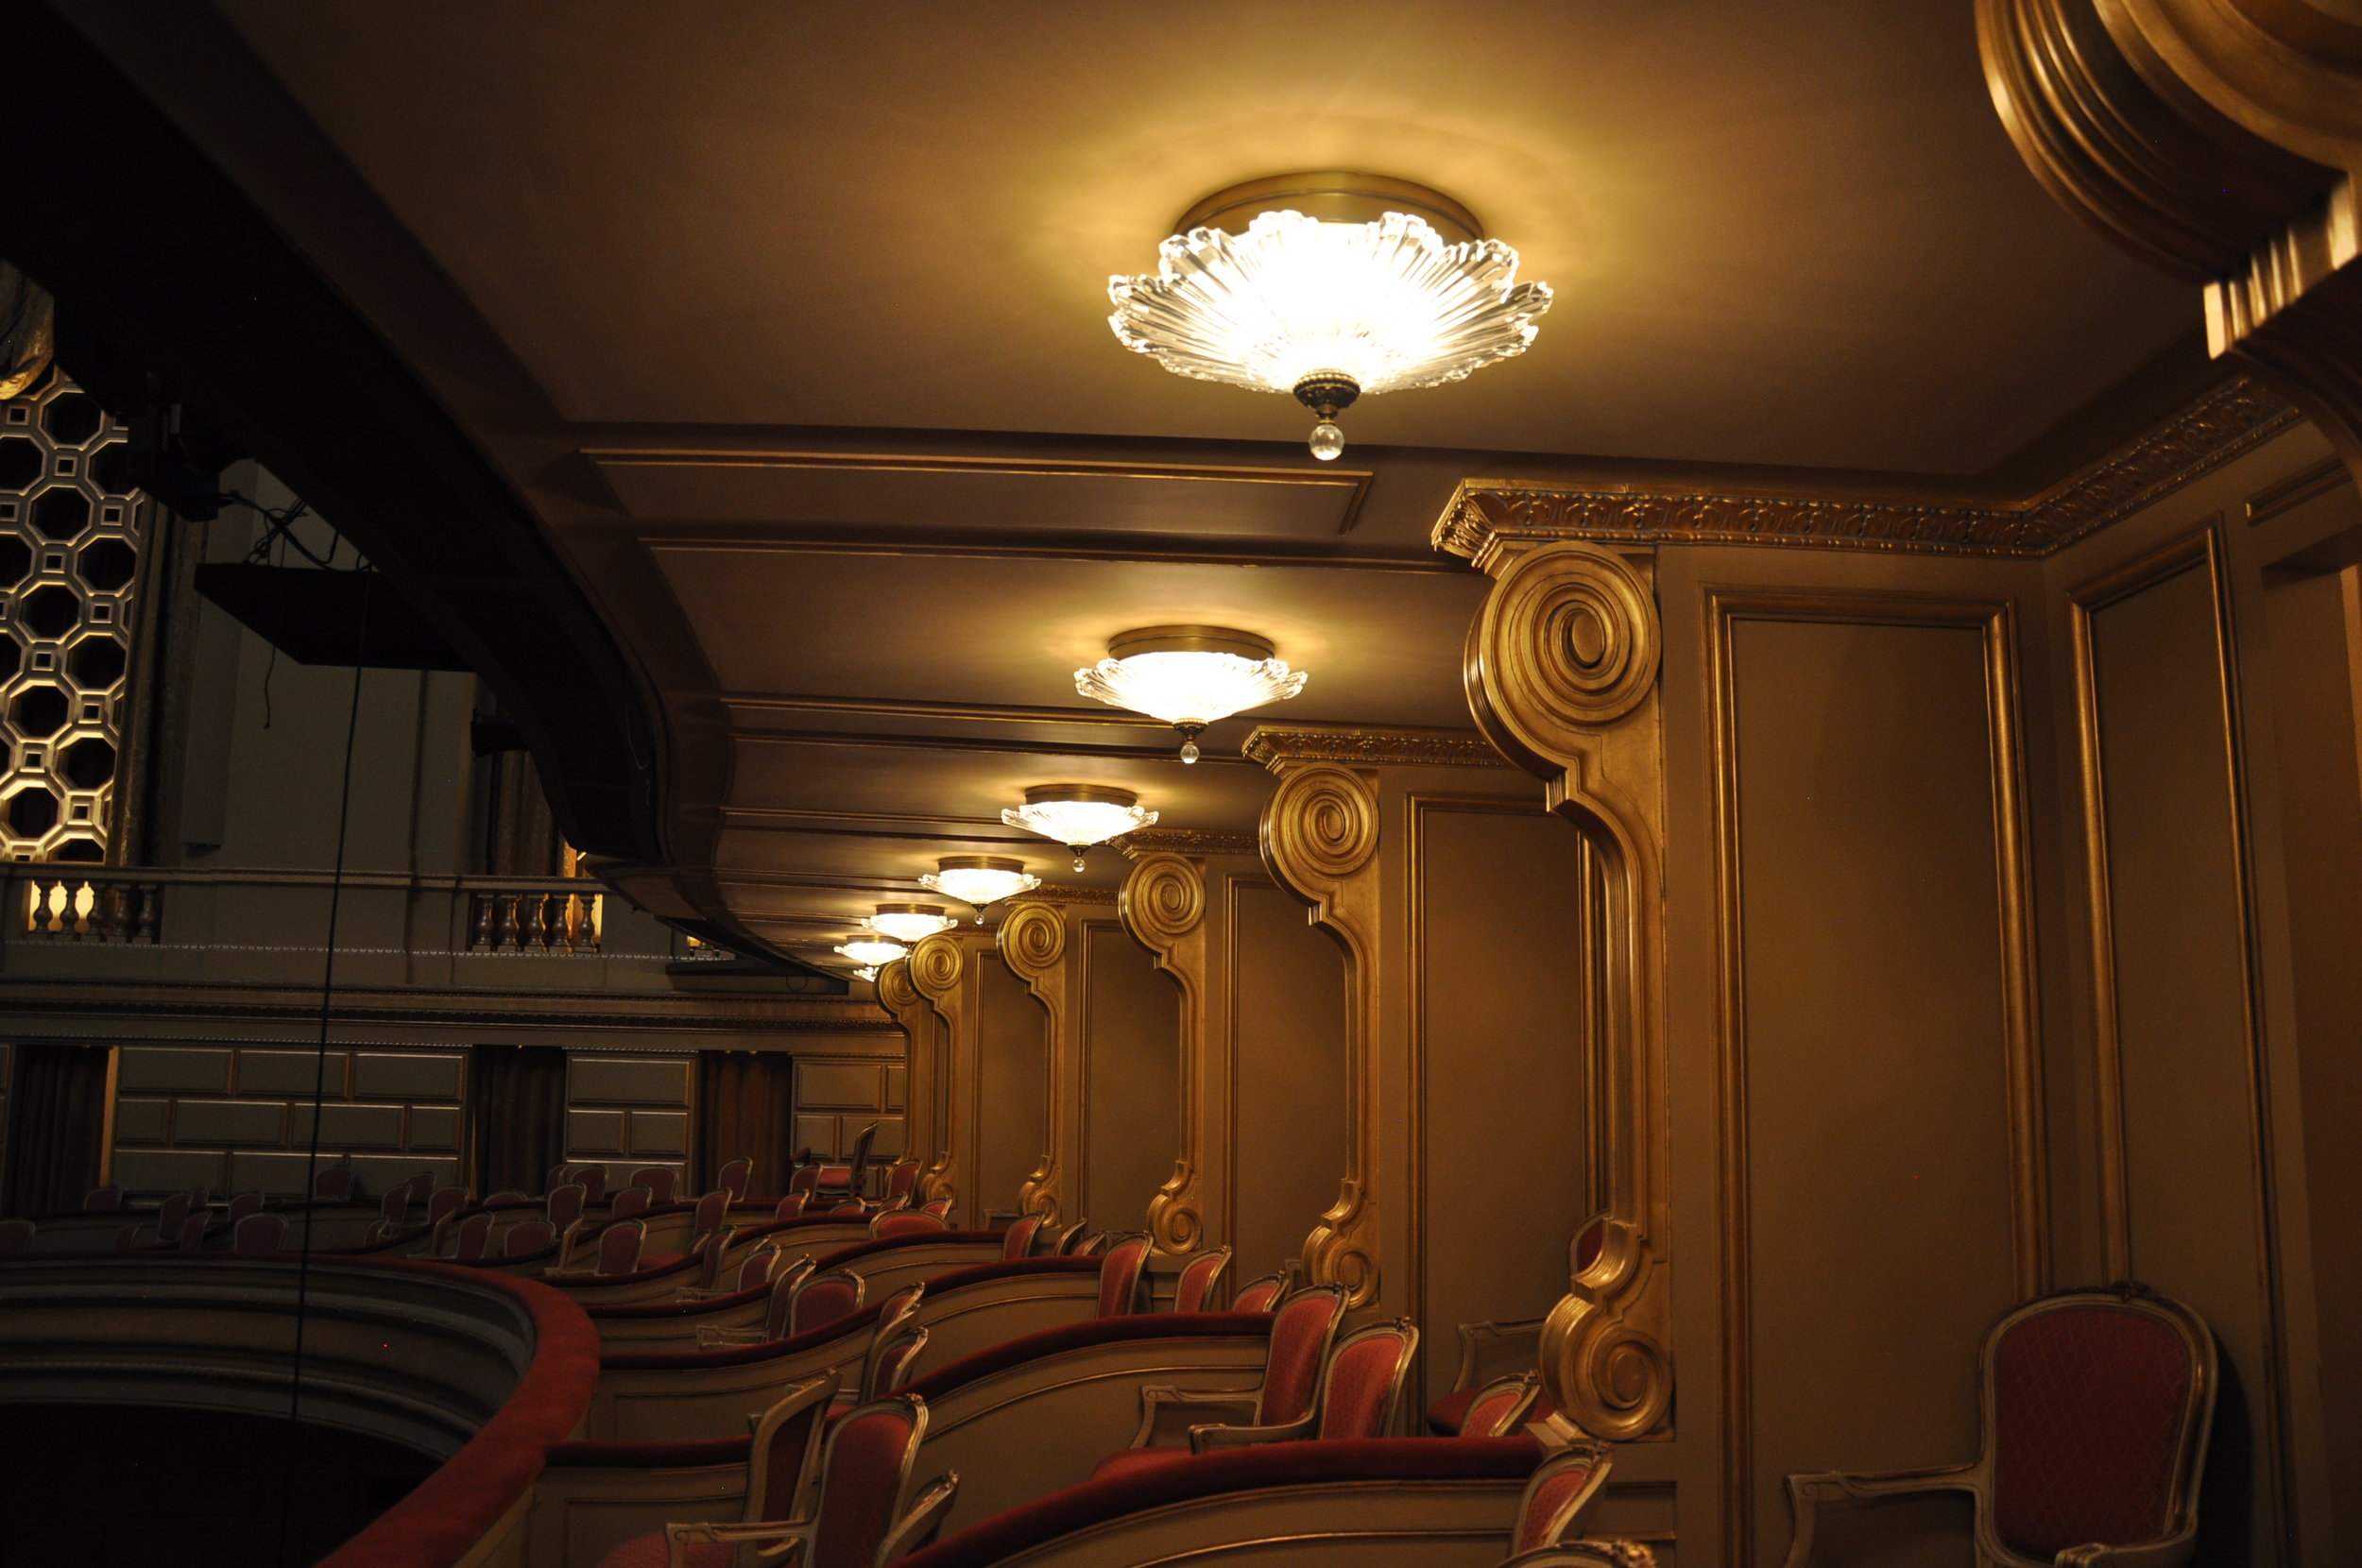 San Francisco War Memorial Opera House Ceiling Lights